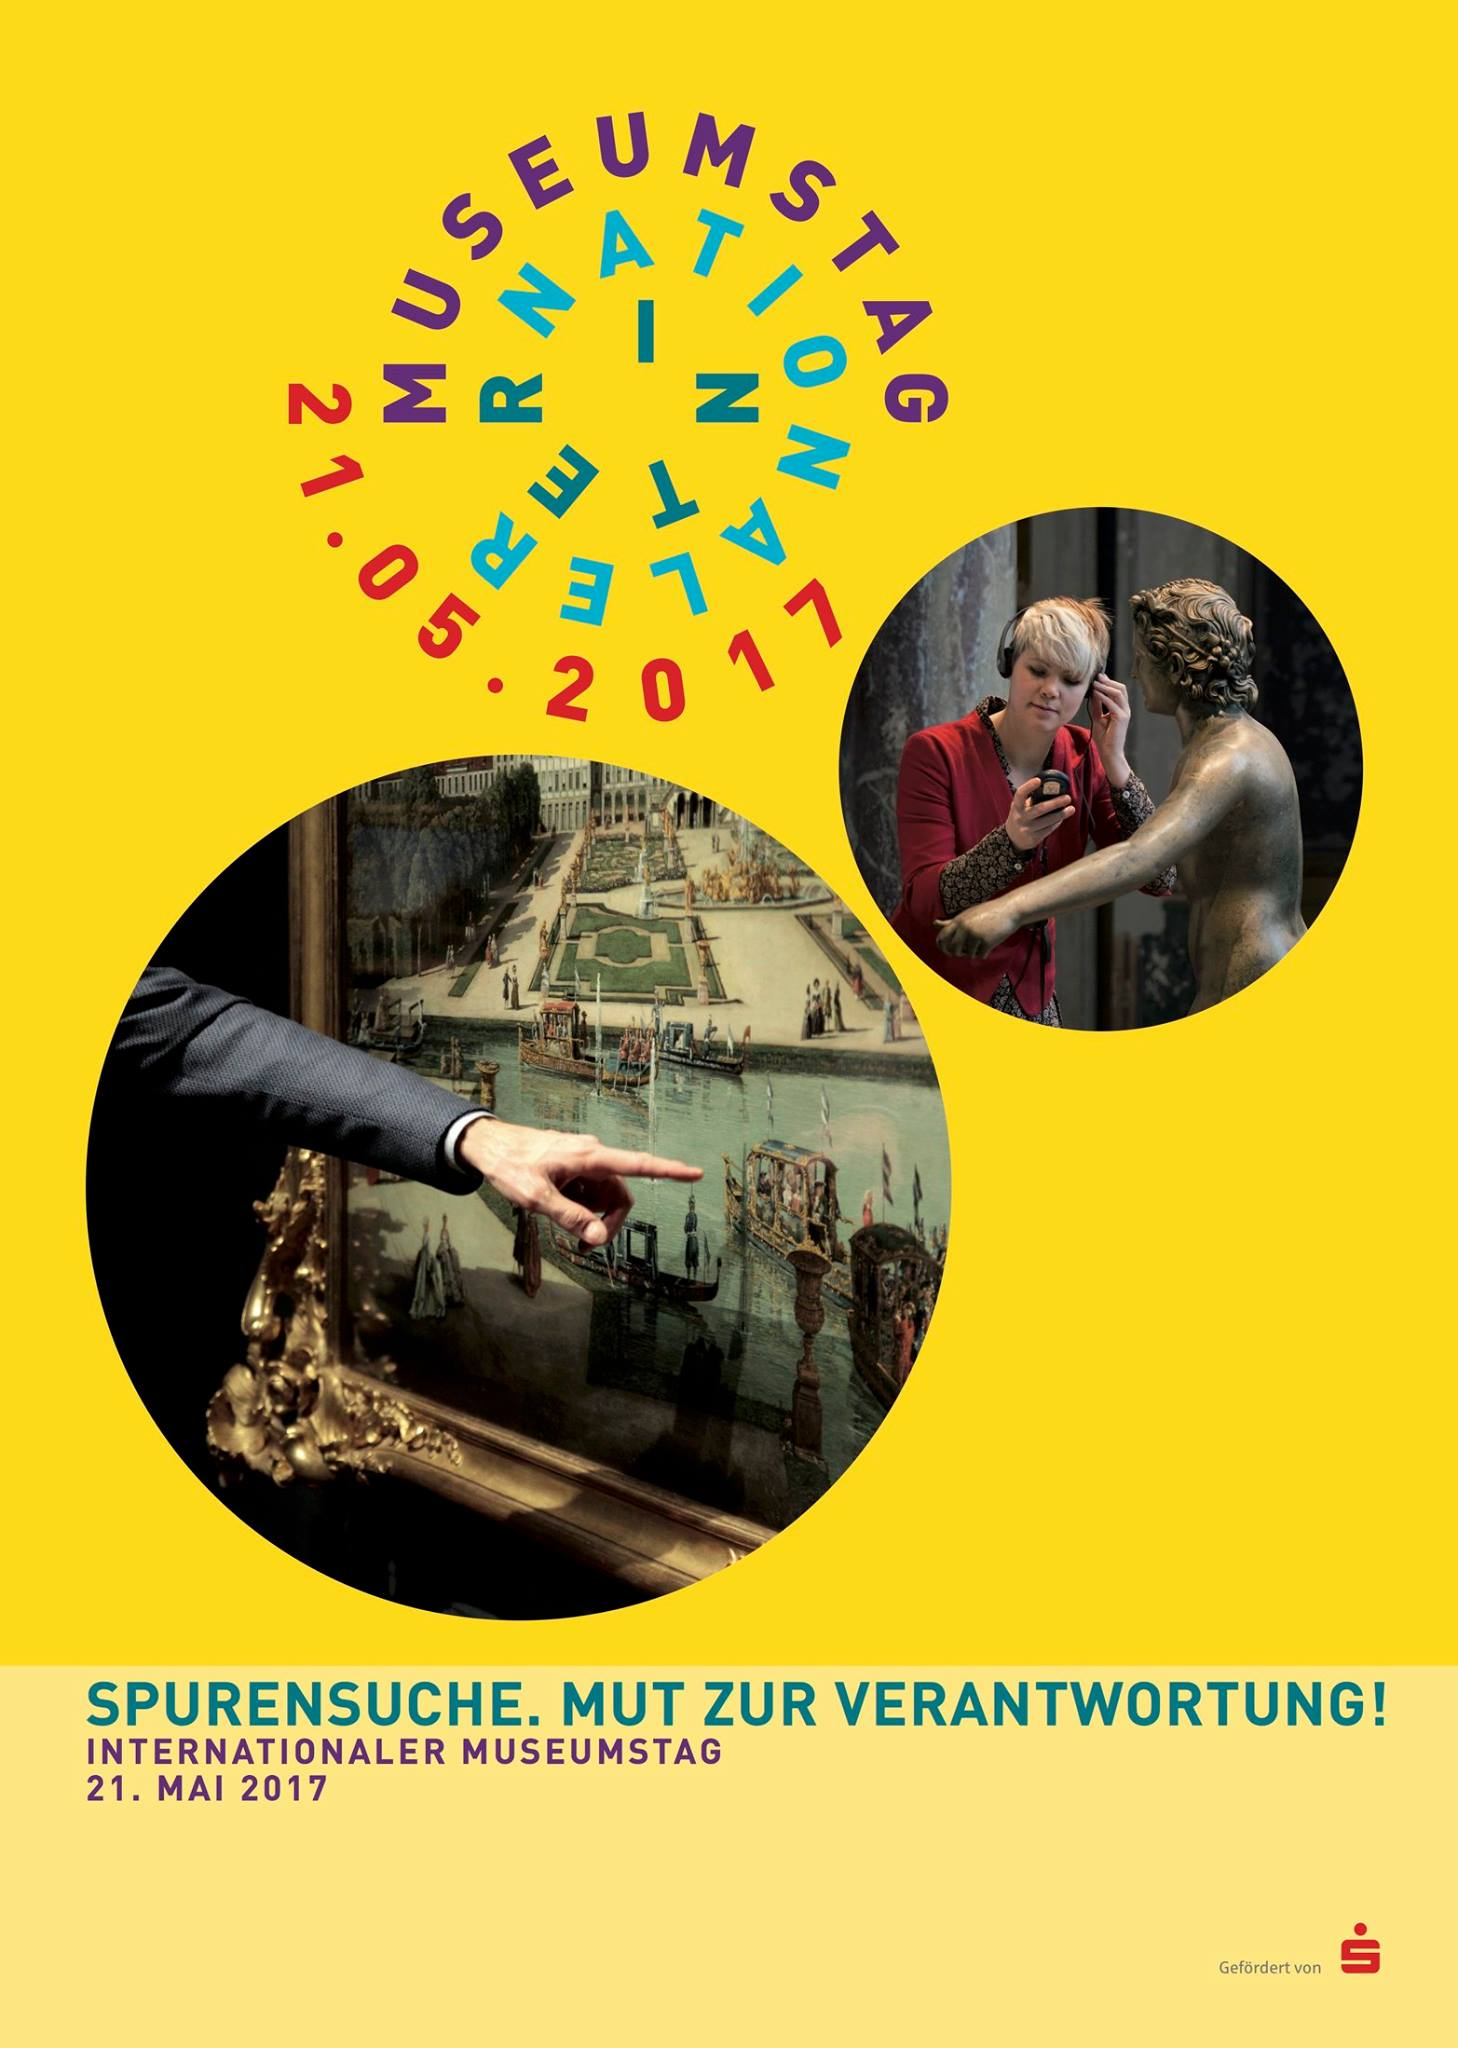 Broschüre zum #IMT17 ist online! Mit Infos zum Internationalen Museumstag am 21. Mai 2017  #Museum #Highlights https://t.co/qDLCptMz3f https://t.co/7So3Ks7V9Y